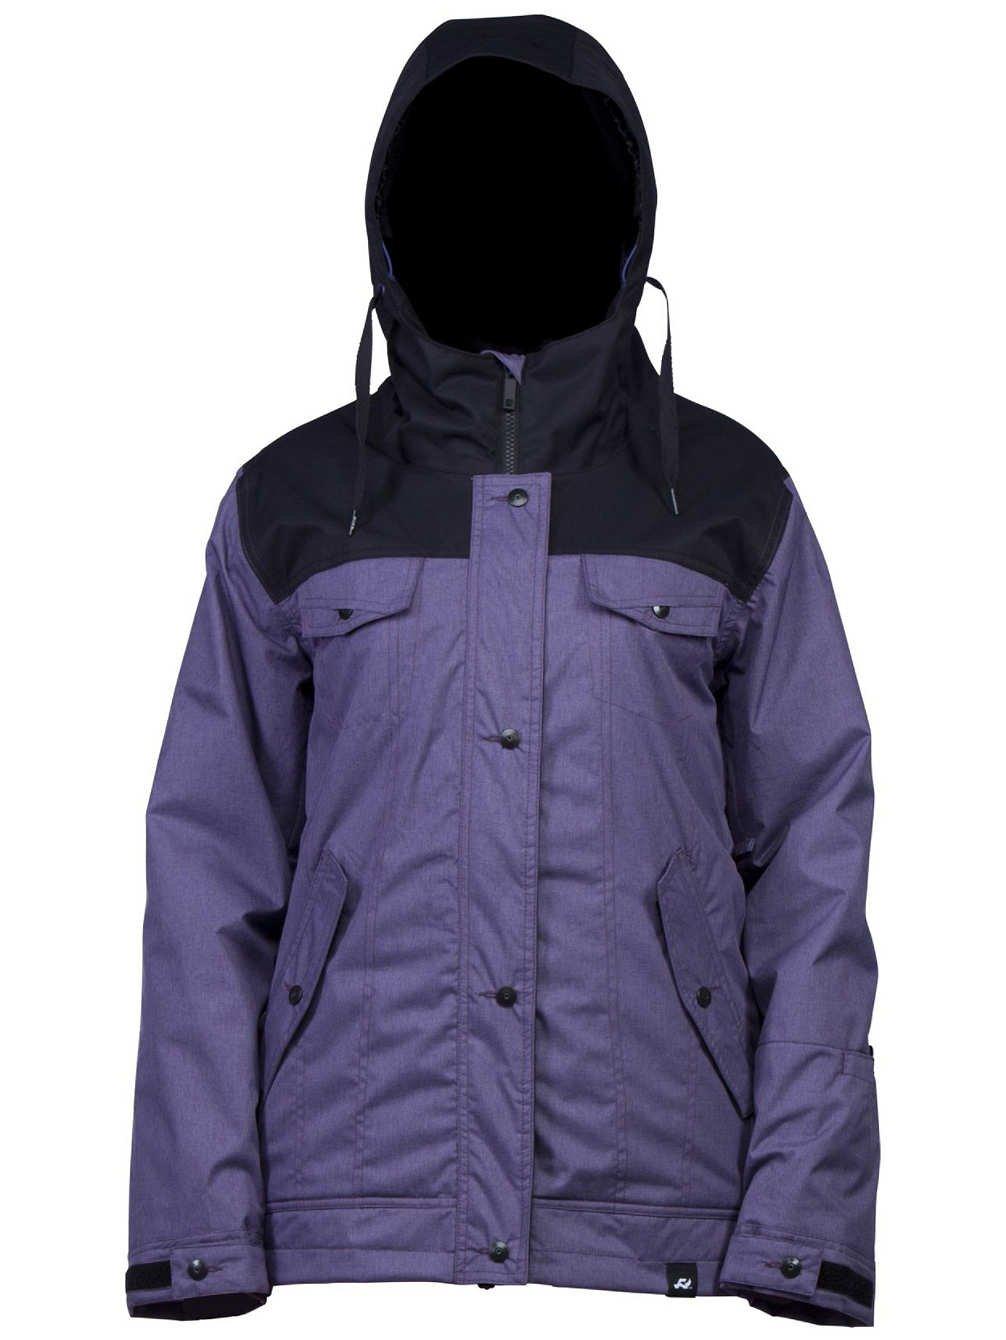 Damen Snowboard Jacke Ride Greenwood Jacket günstig